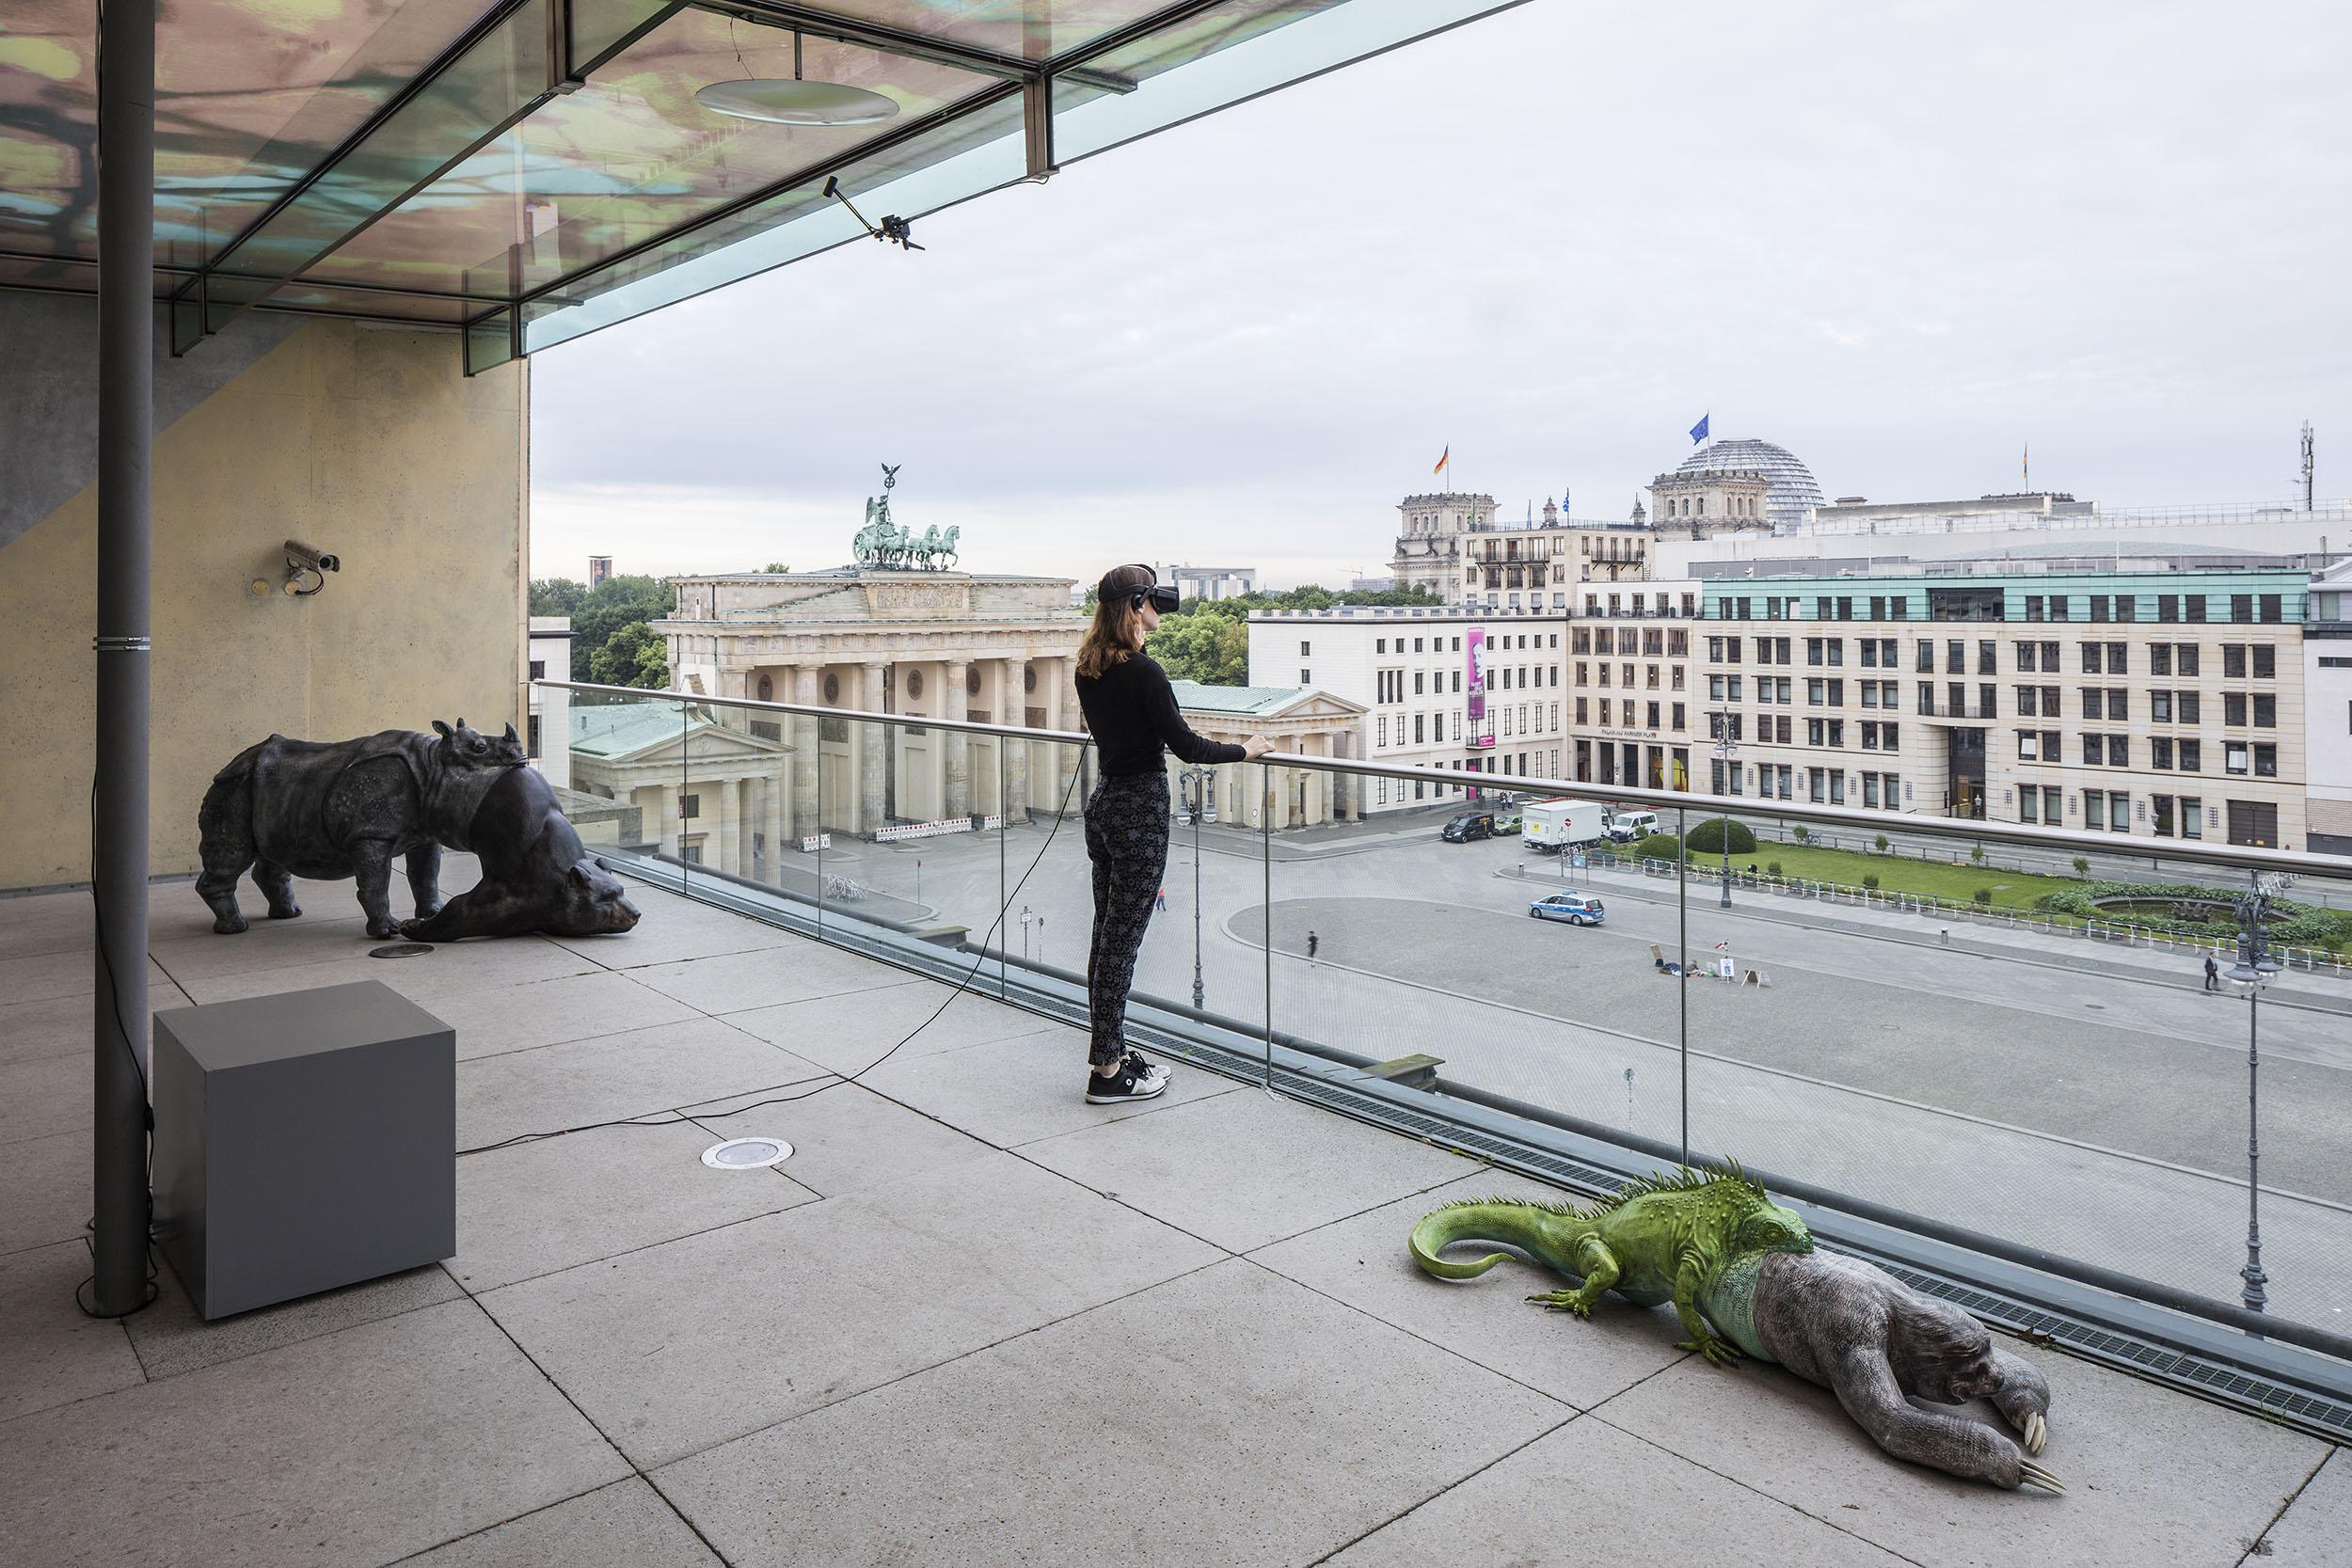 Jon Rafman. L'Avalée des avalés (The Swallower Swallowed) Rhino/Bear, Berlin Biennale 9, 2016